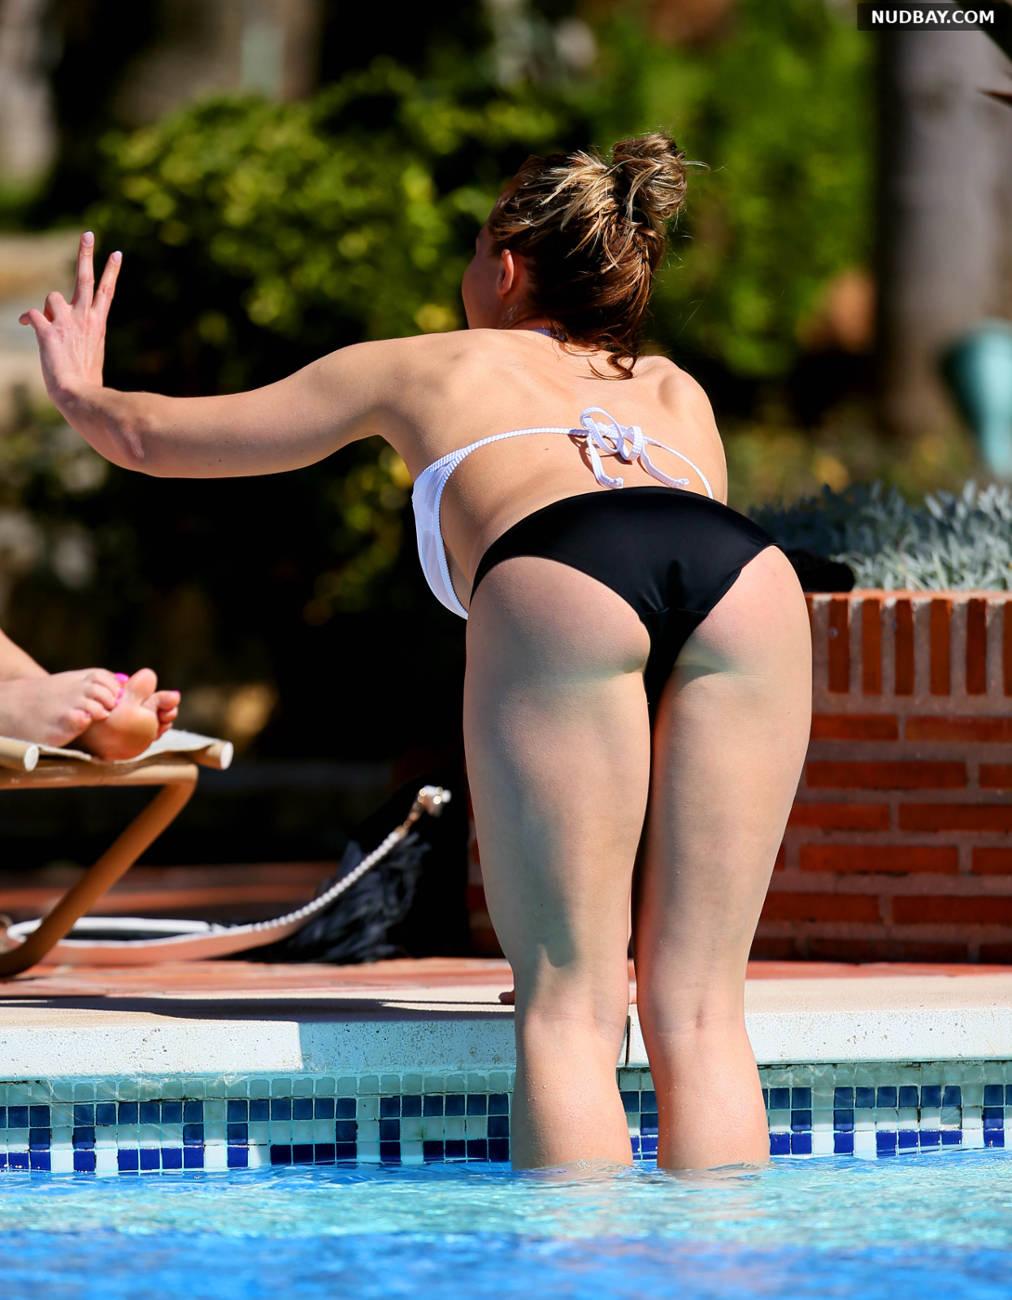 Gemma Atkinson wearing a bikini in Marbella Oct 14 2016